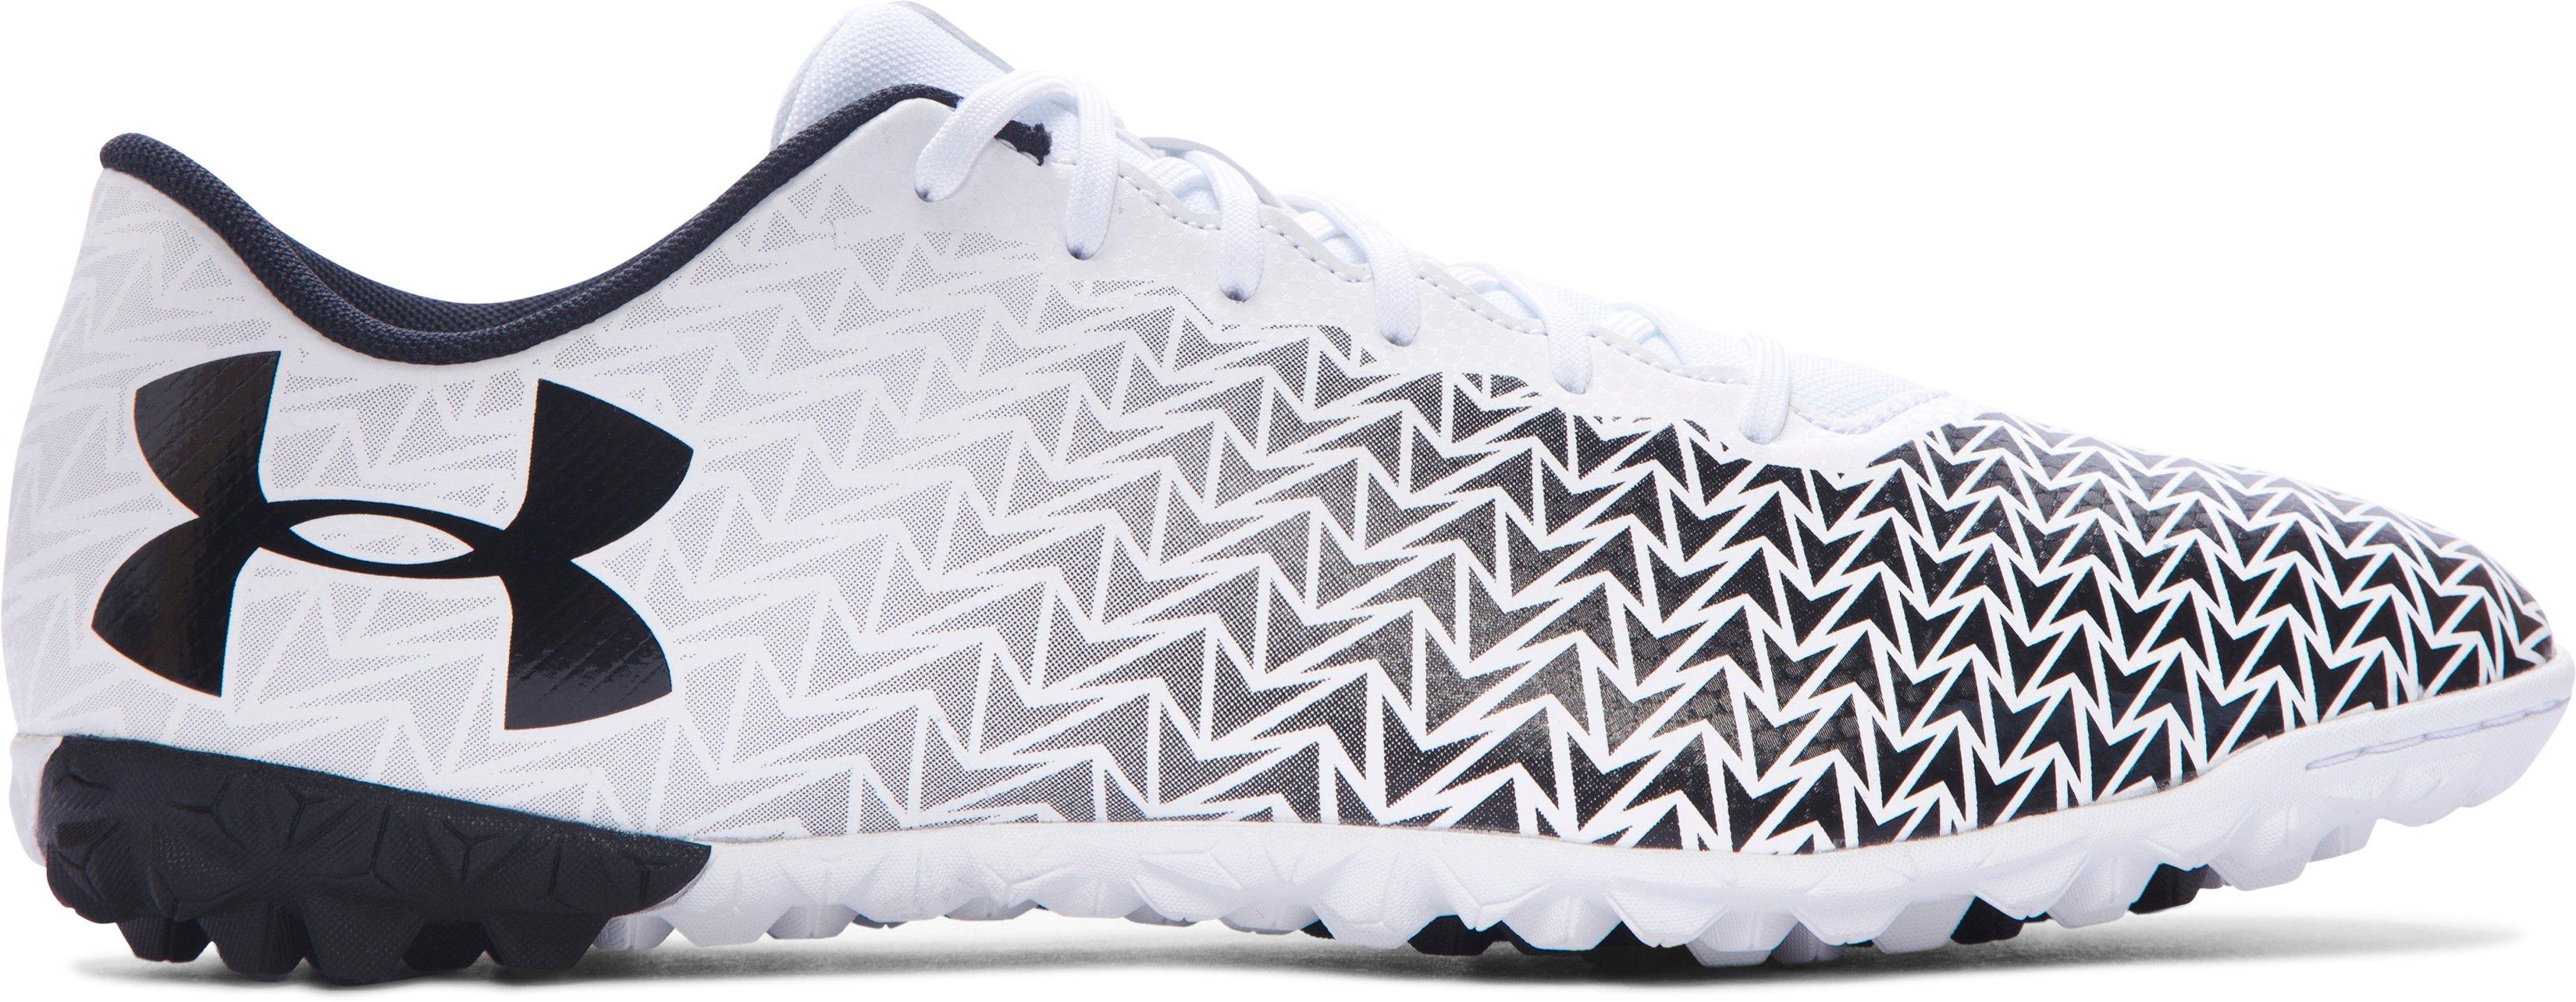 Zapato para Futbol UA CF Force 3.0 Turf para Hombre, 360 degree view